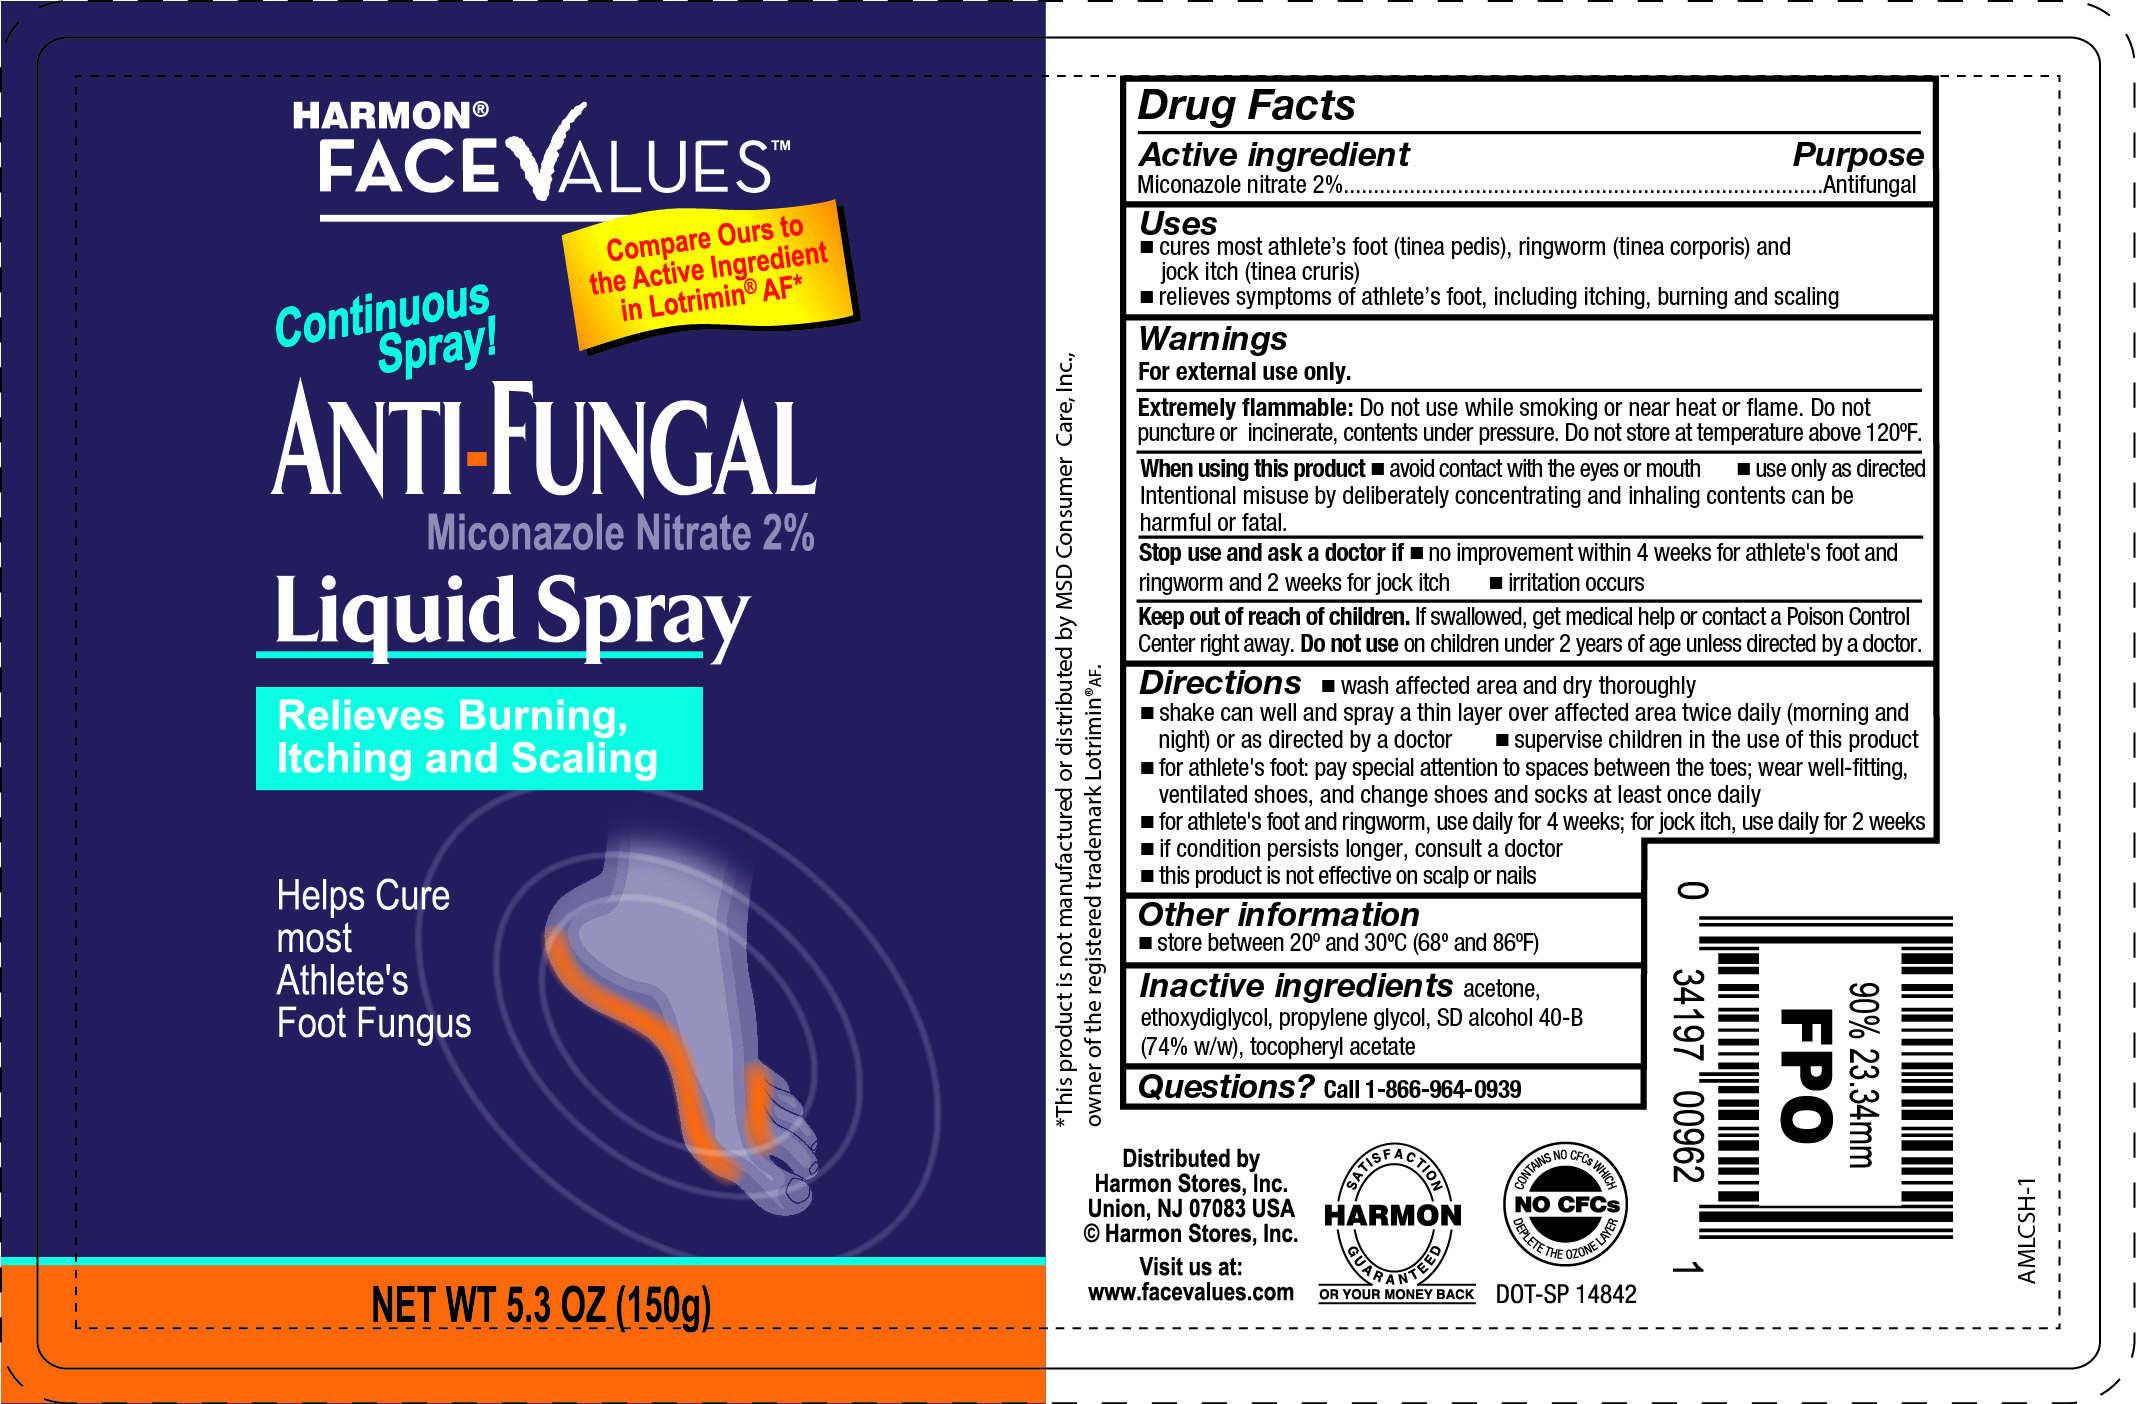 Harmon Antifungal Miconazole Liquid Continuous Spray.jpg